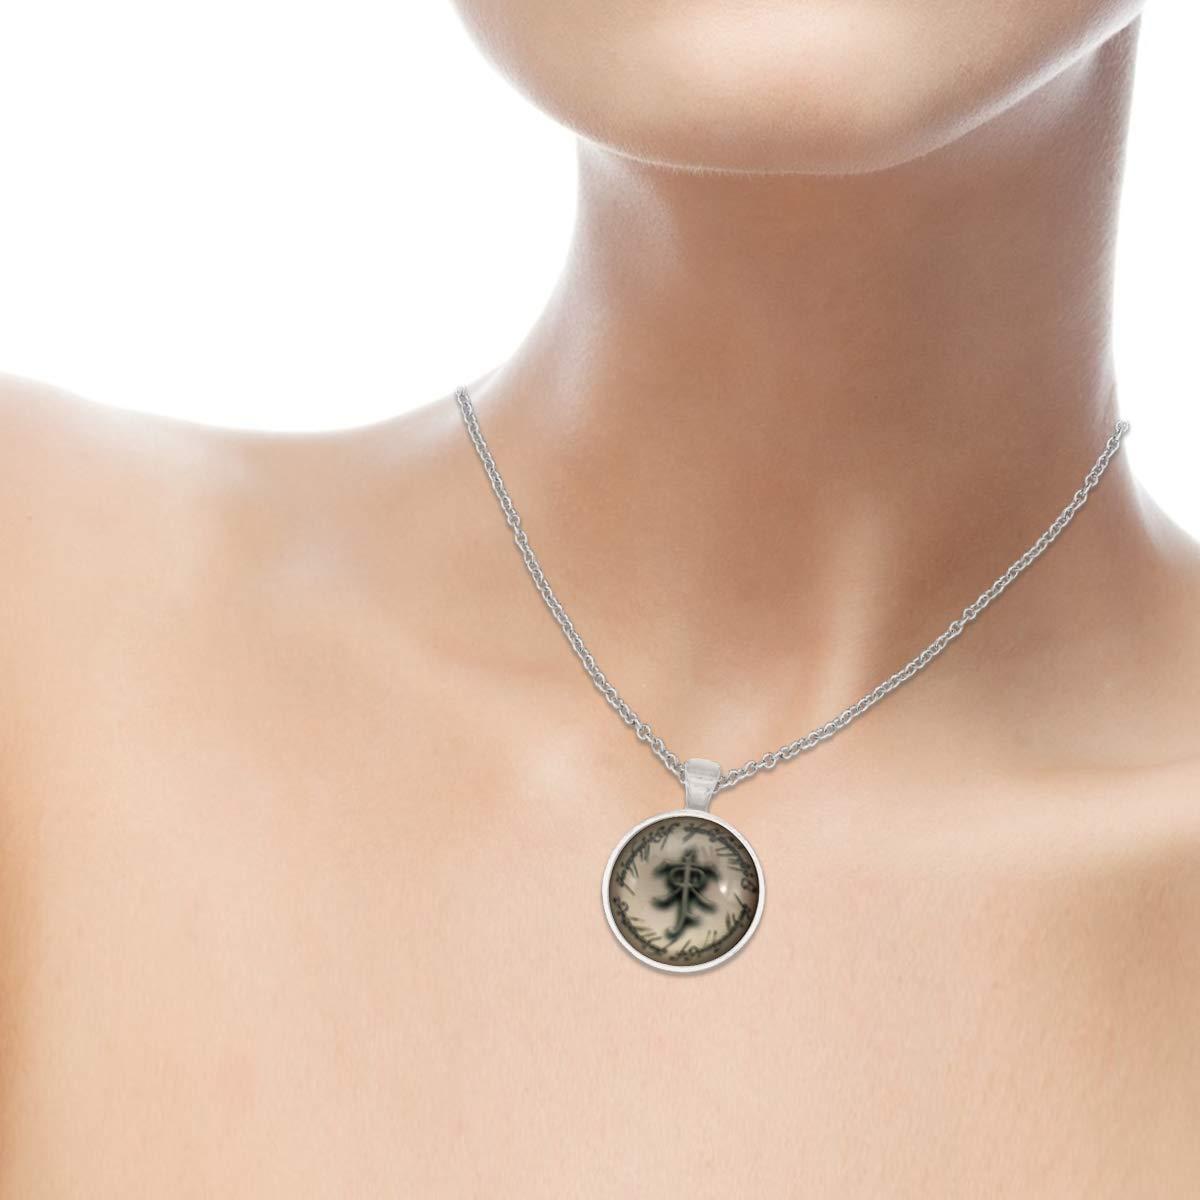 Family Decor Wortkunst Pendant Necklace Cabochon Glass Vintage Bronze Chain Necklace Jewelry Handmade